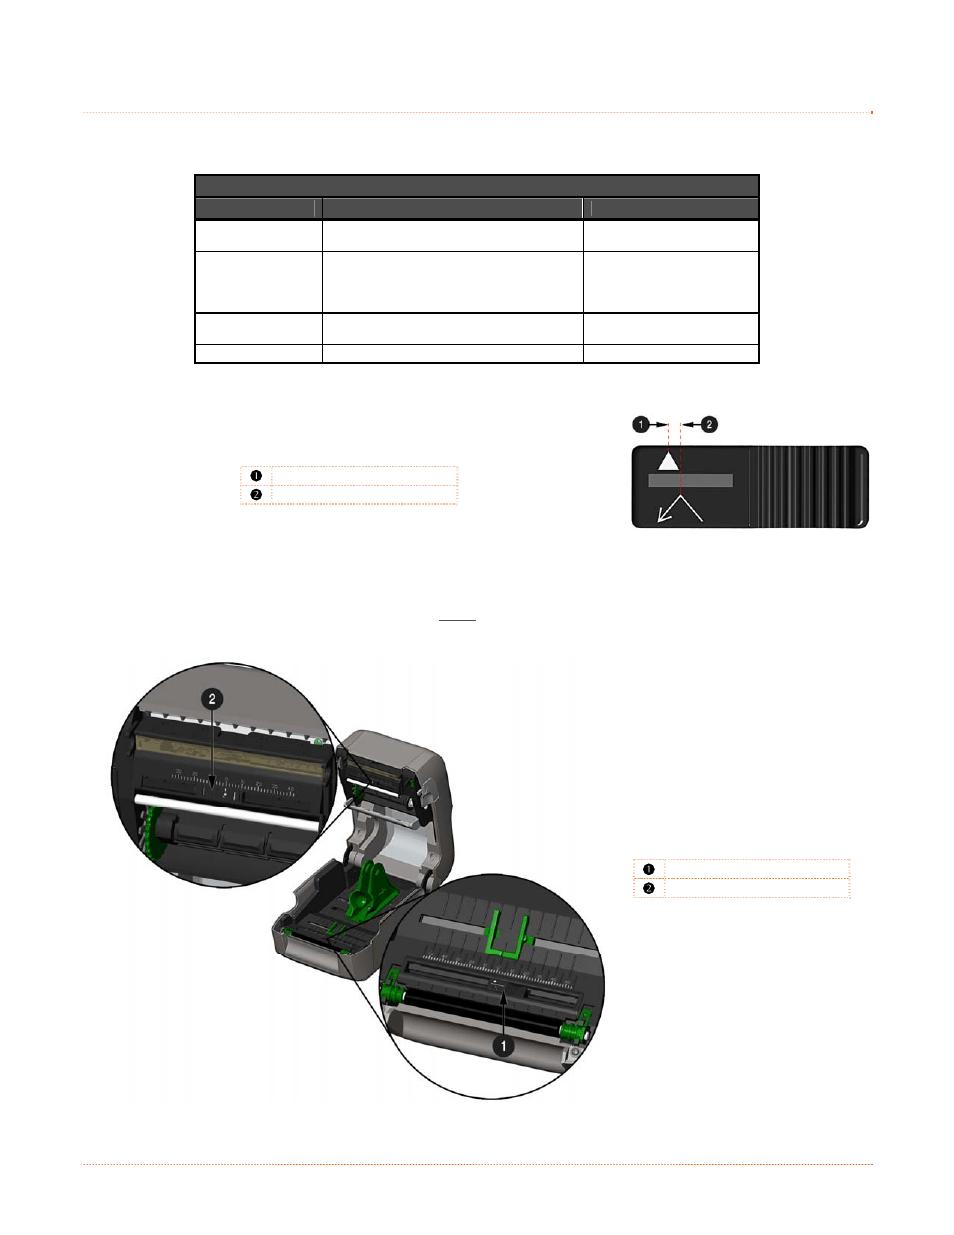 Datamax-O'Neil E-Class Mark III Operator's Manual User